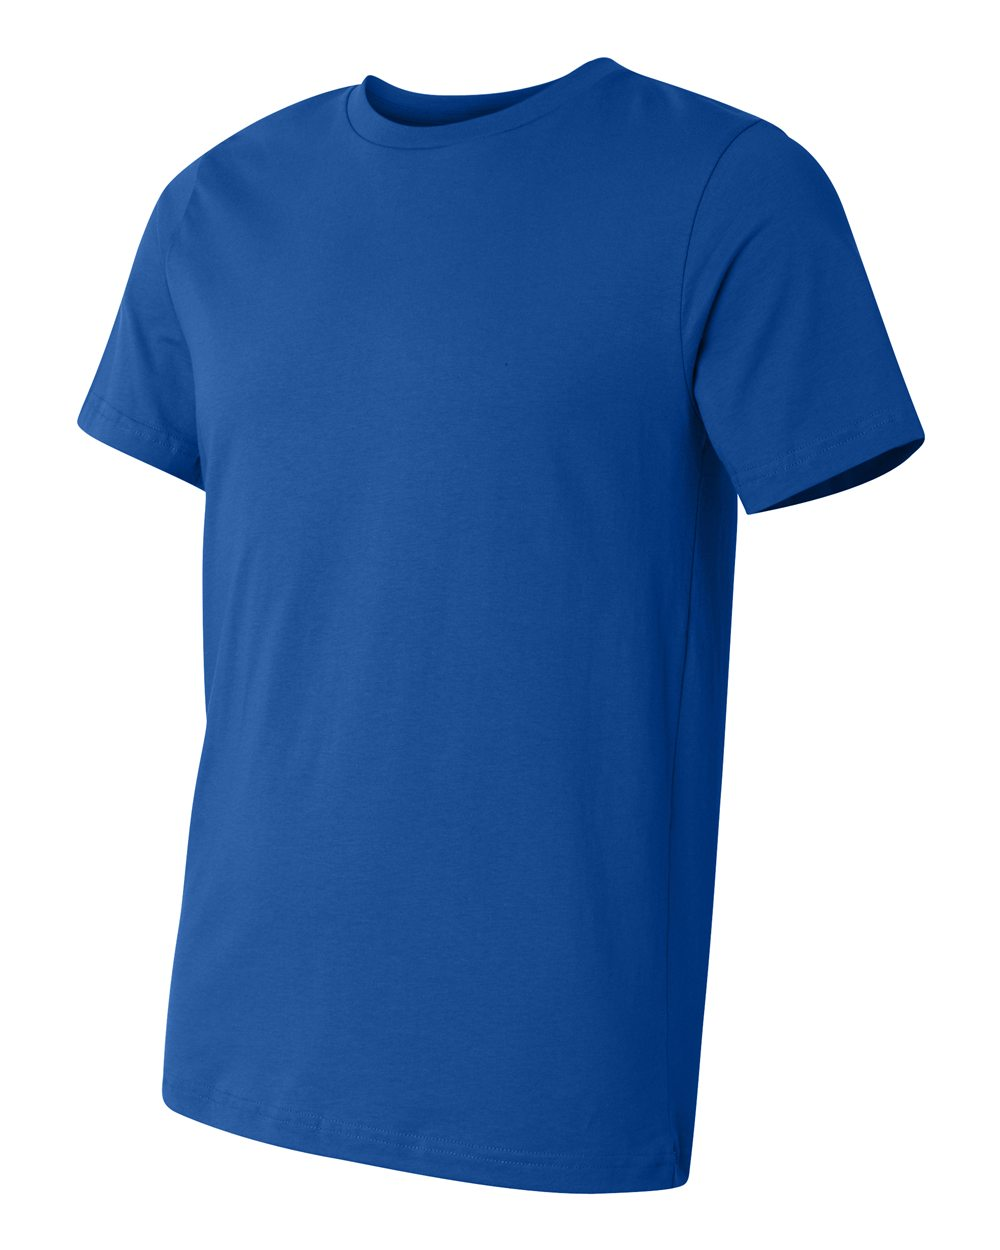 Bella-Canvas-Unisex-Made-in-USA-Jersey-Short-Sleeve-T-Shirt-3001U-XS-3XL thumbnail 27